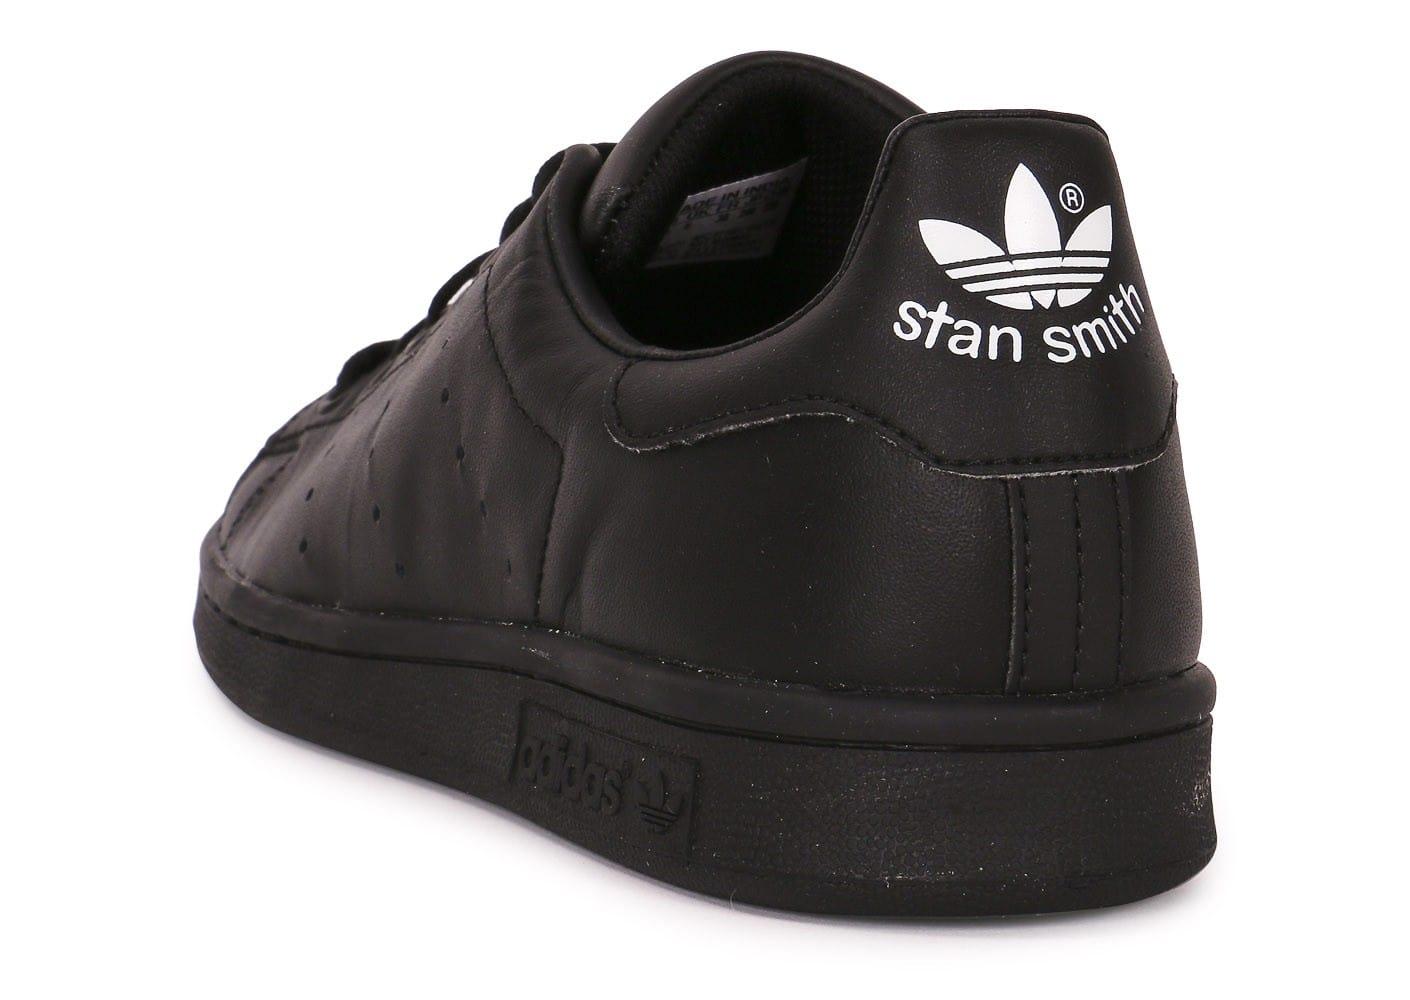 grand choix de 417df e2c62 adidas stan smith ii noir une vente de liquidation de prix ...